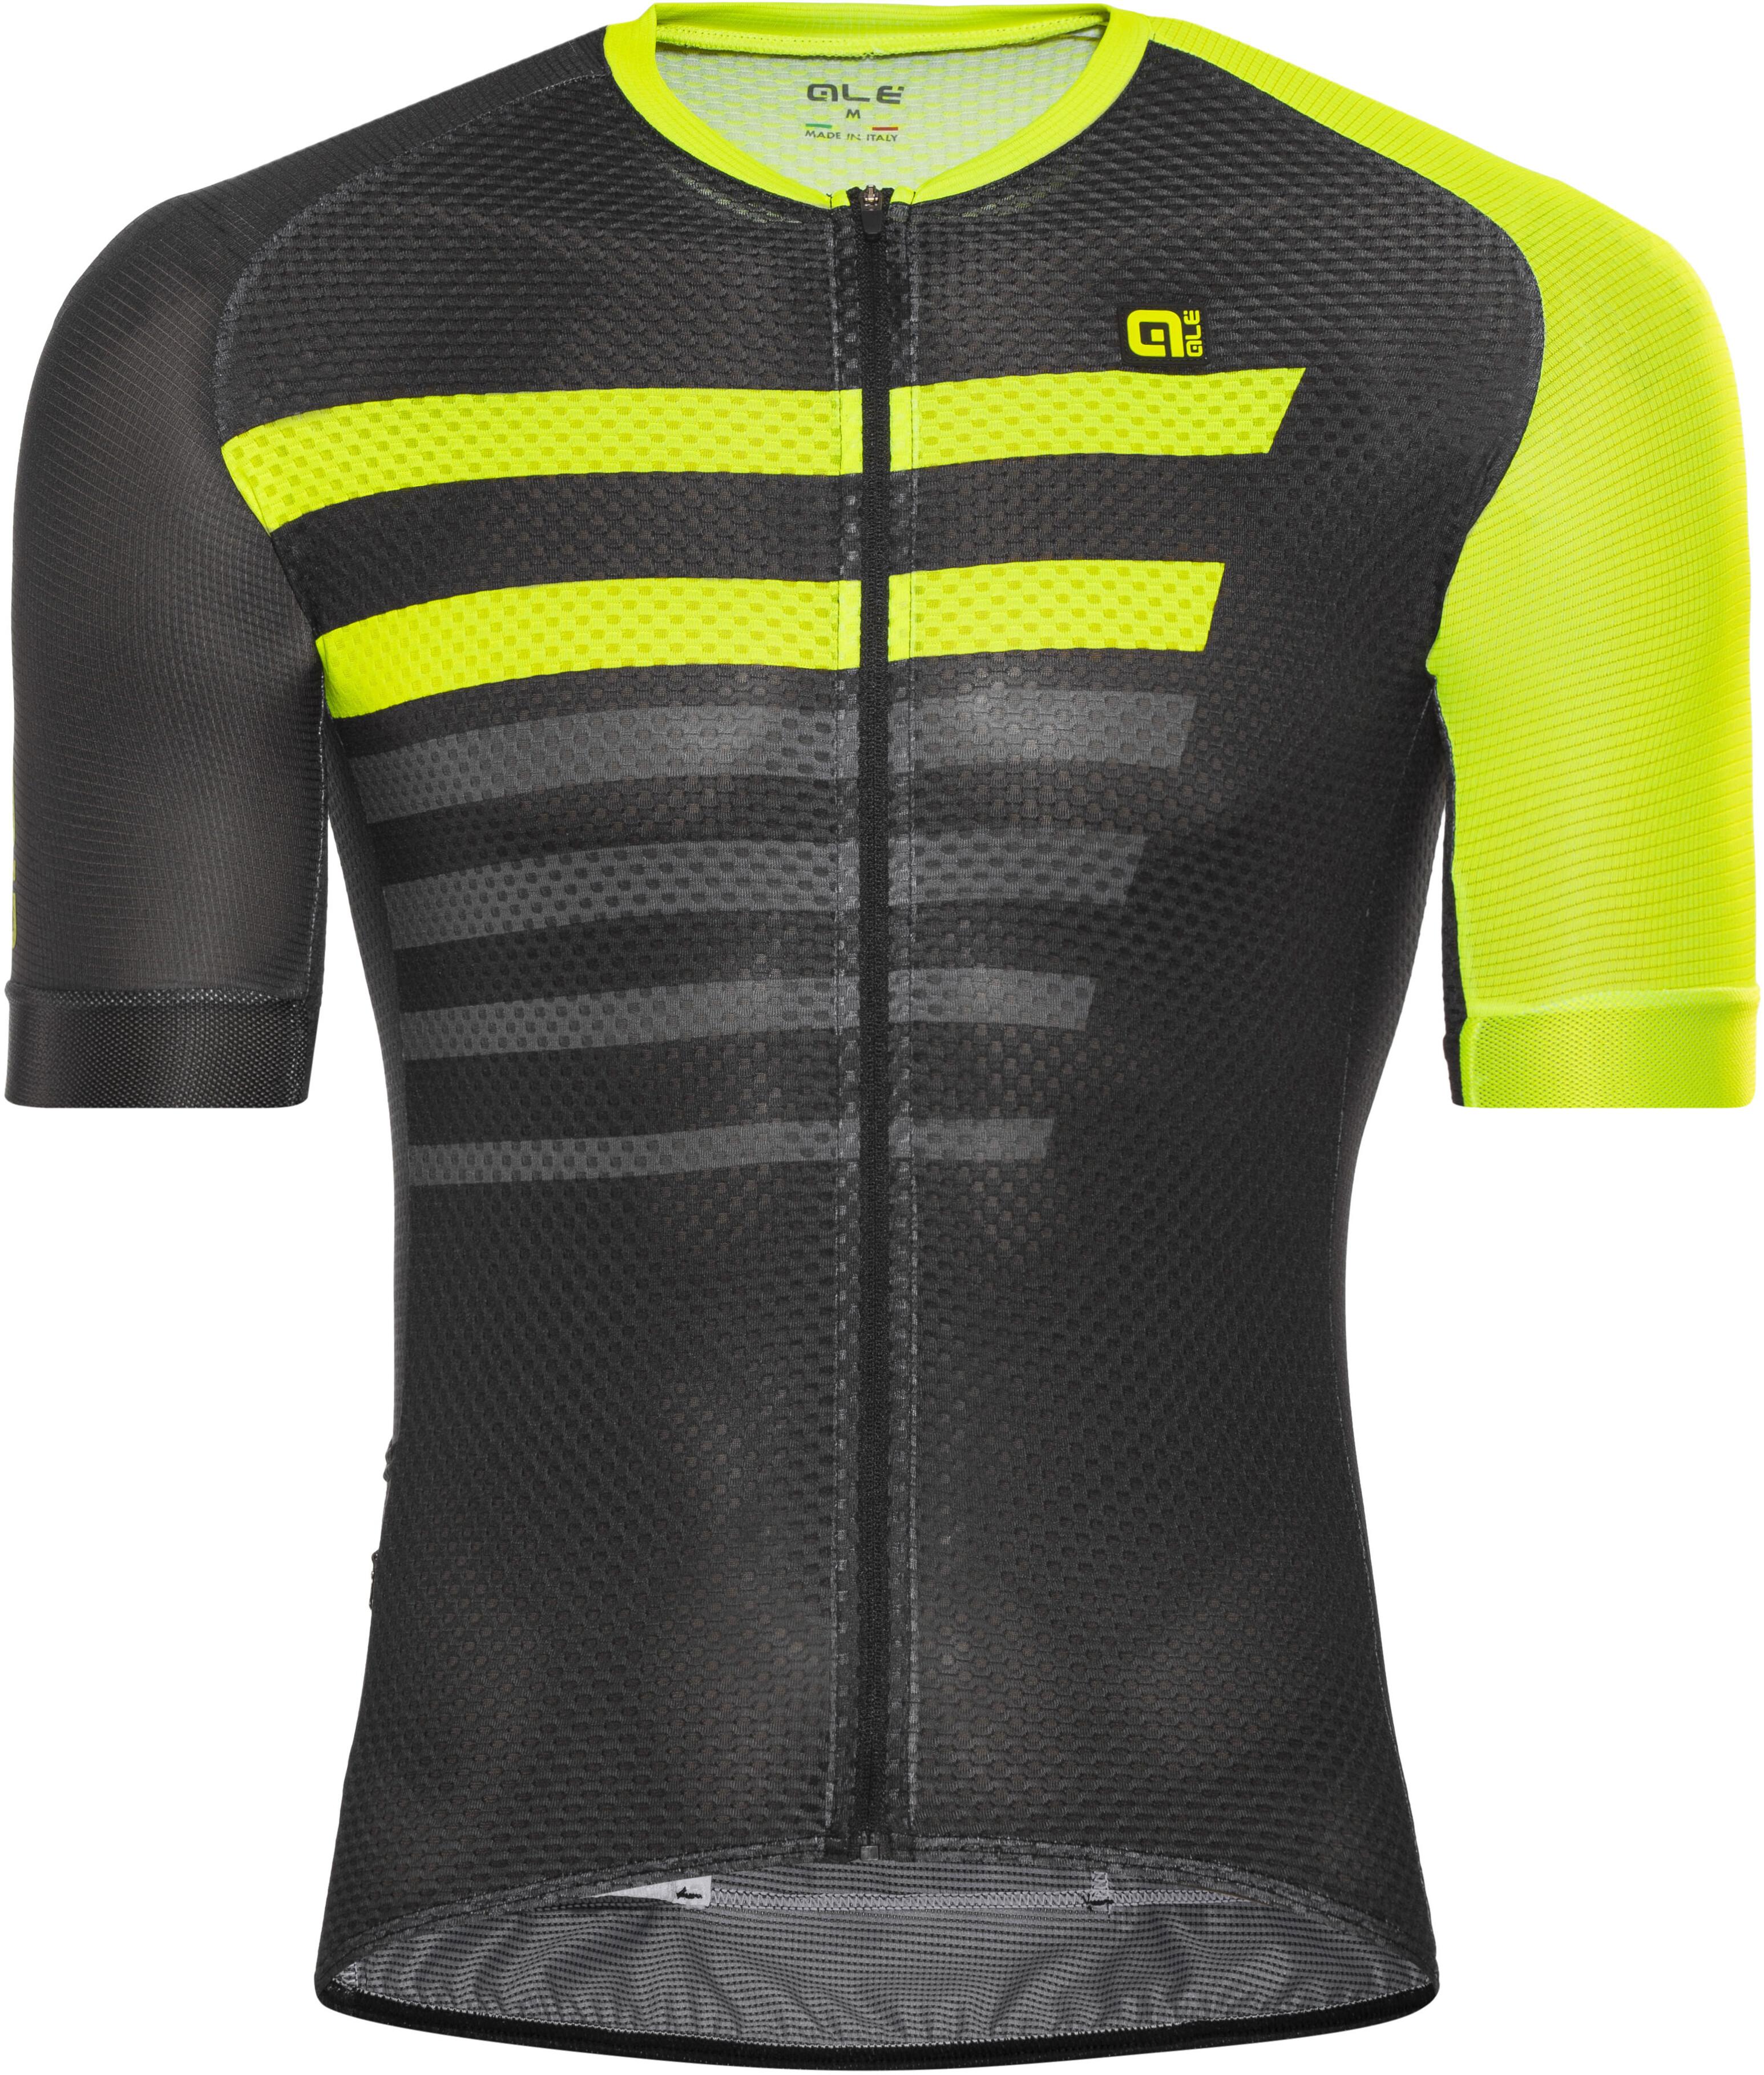 f4ea8ebc8 Alé Cycling PRR 2.0 Piuma Bike Jersey Shortsleeve Men yellow black ...